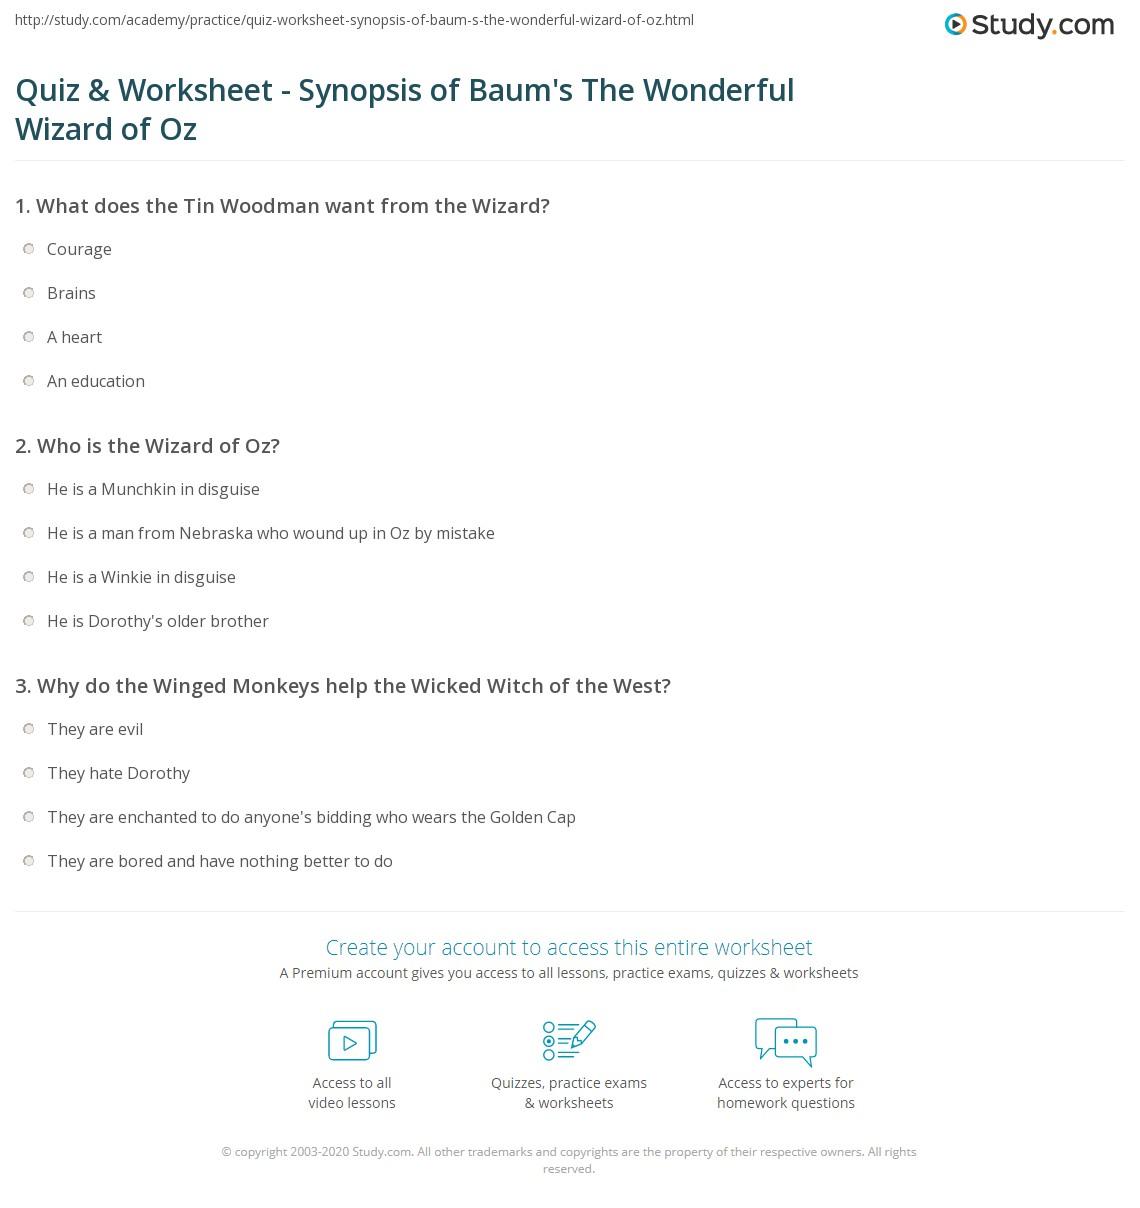 quiz worksheet synopsis of baum 39 s the wonderful wizard of oz. Black Bedroom Furniture Sets. Home Design Ideas